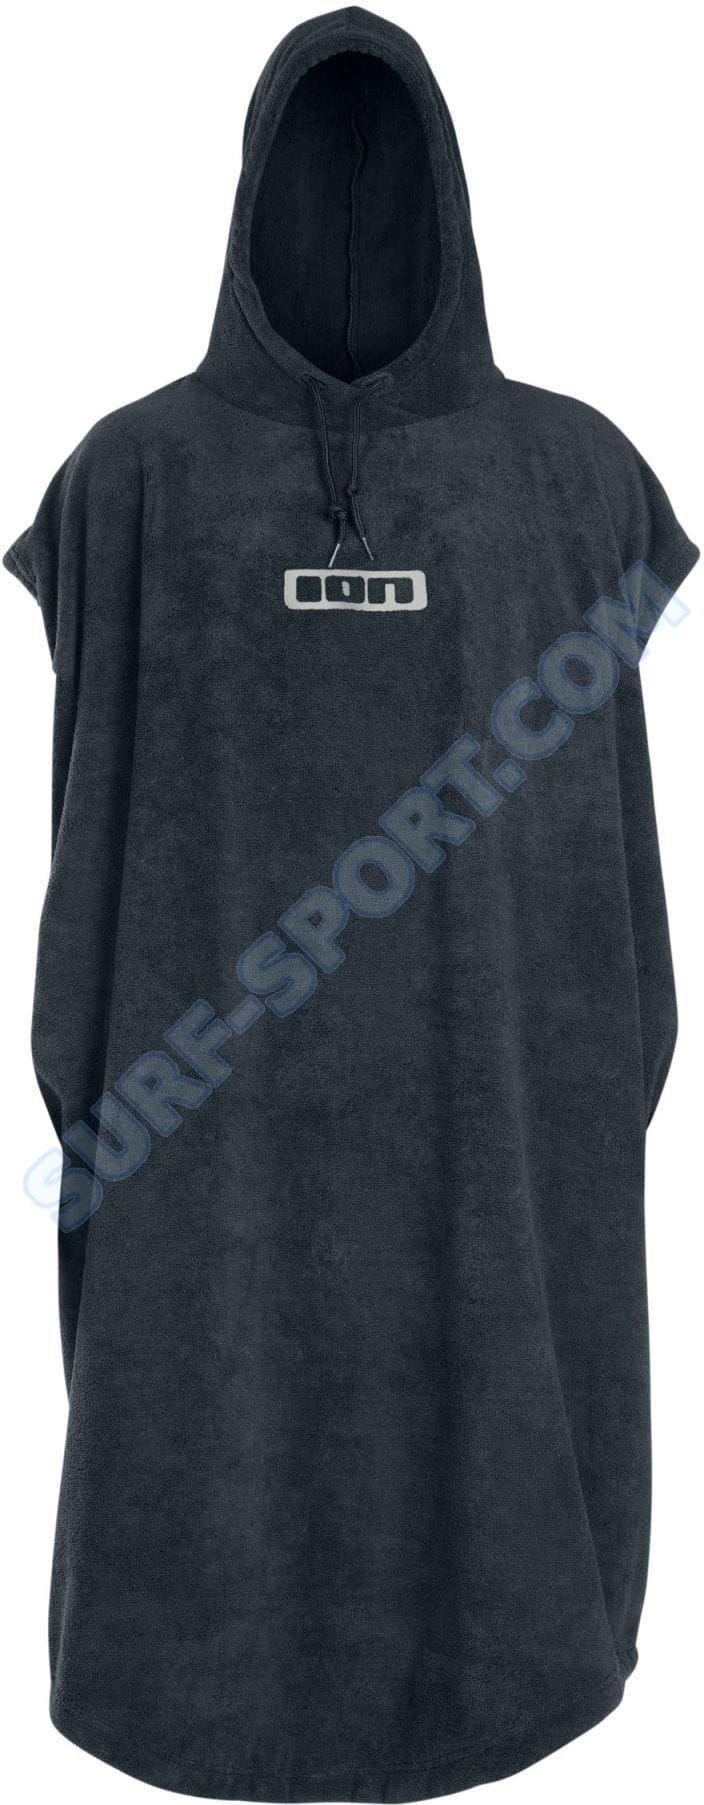 Poncho ION Core 2021 Steel/Gray